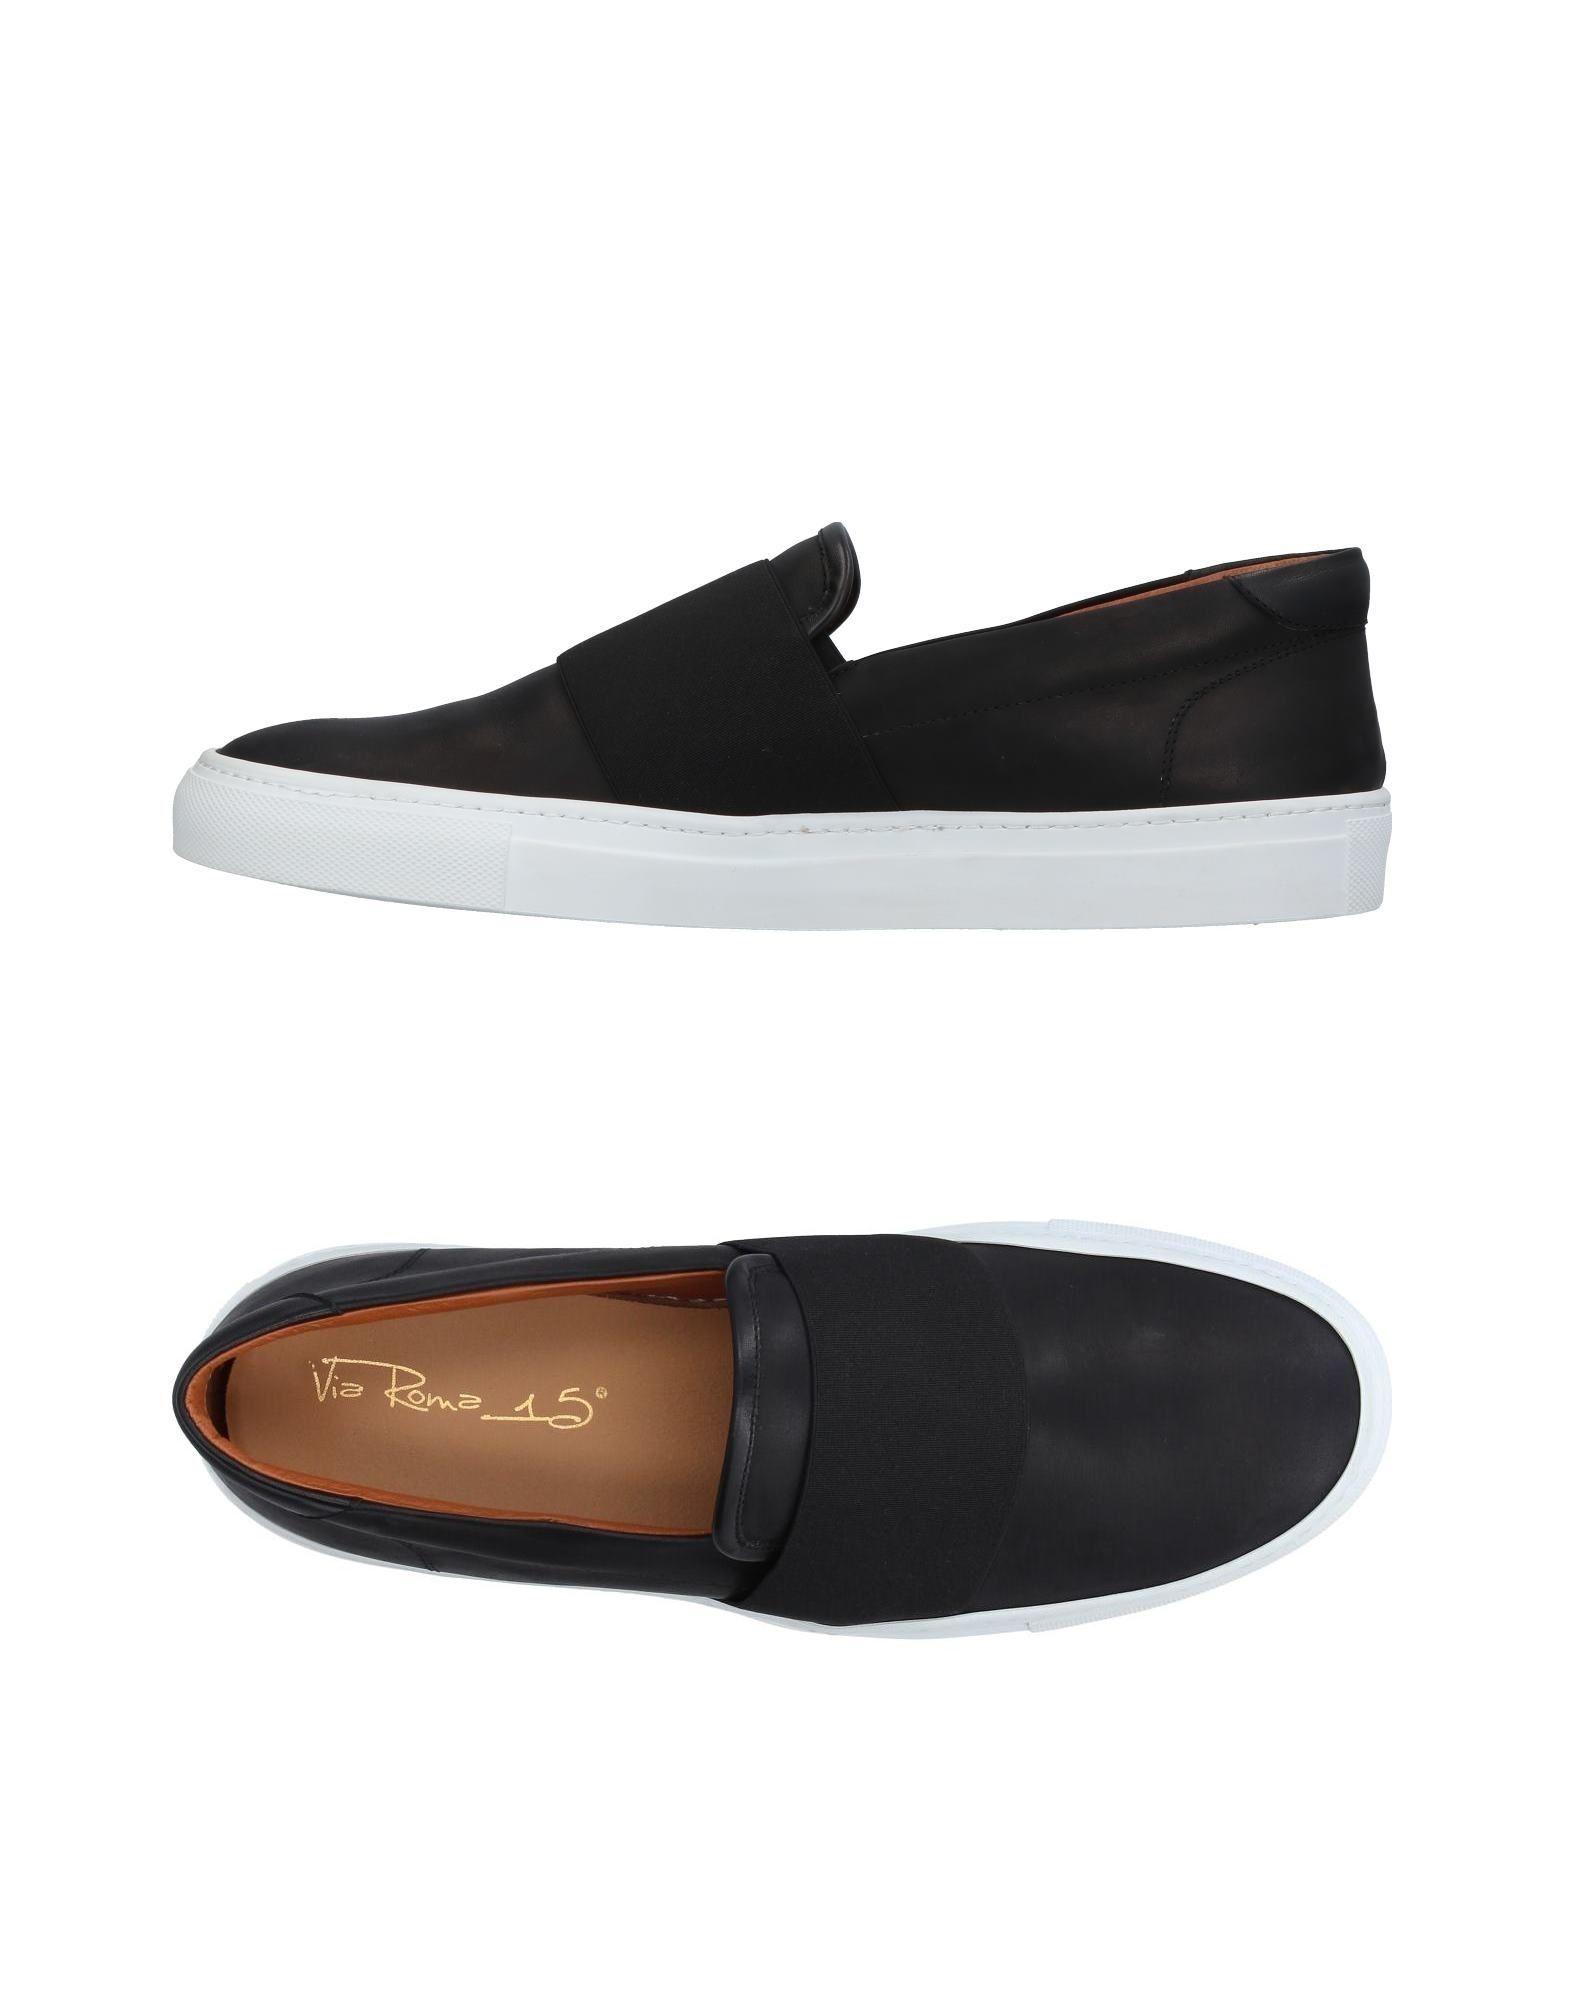 Rabatt echte Schuhe Via Roma 15 Sneakers Herren  11369607AC